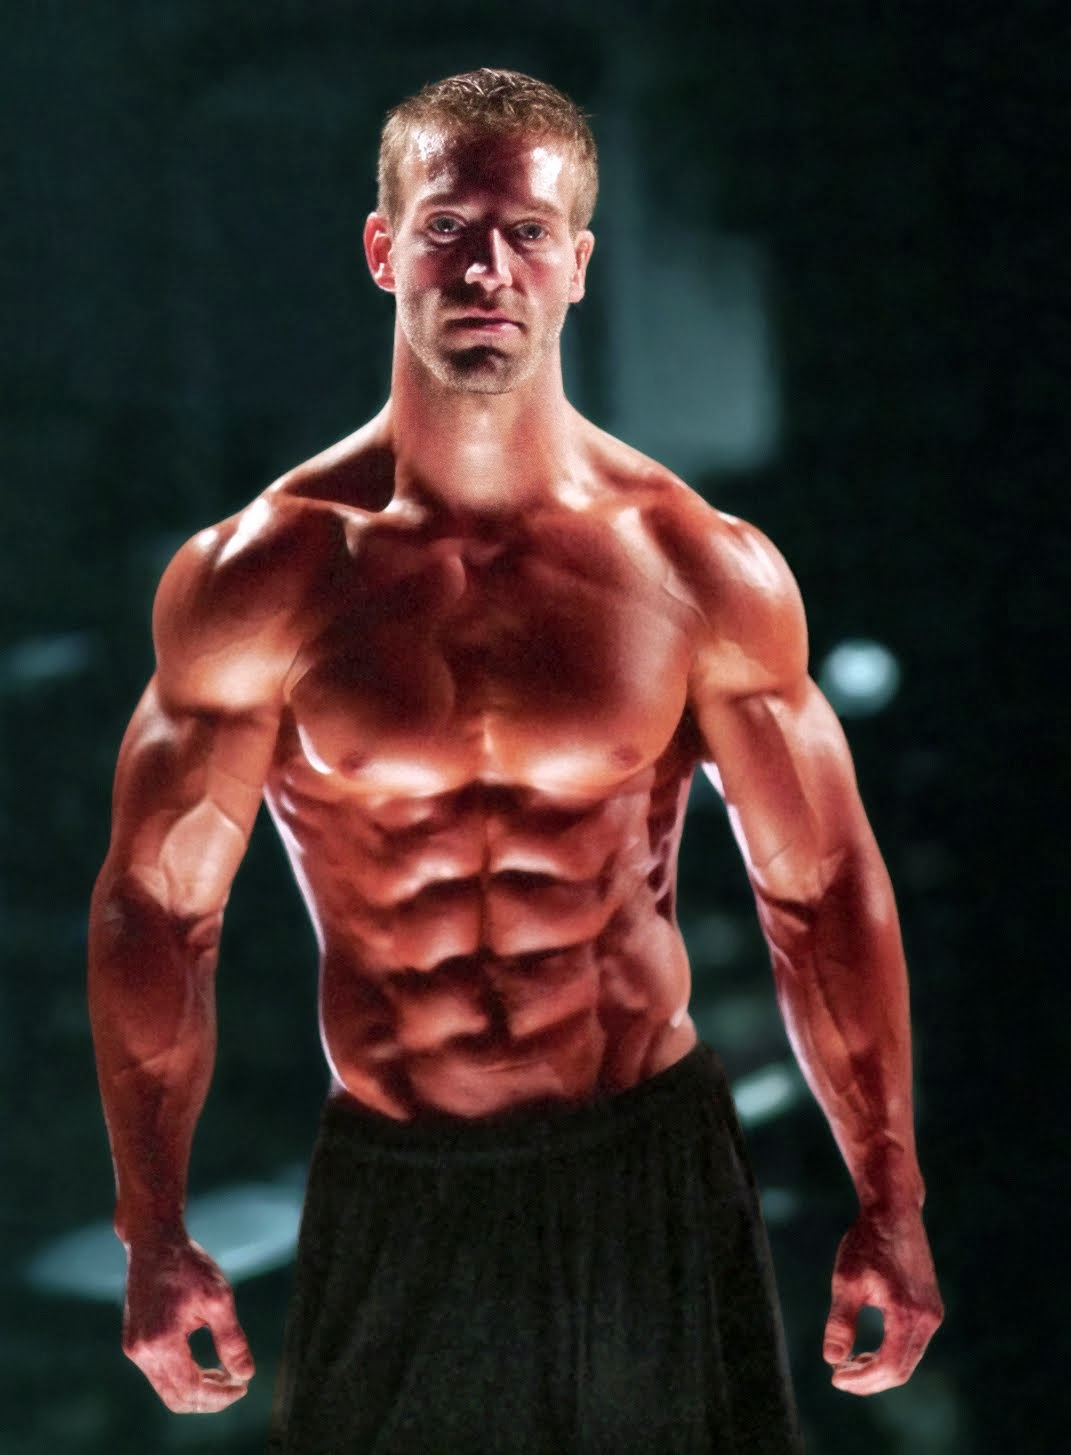 Daily Bodybuilding Motivation: Fitness Model Alex Atanasov